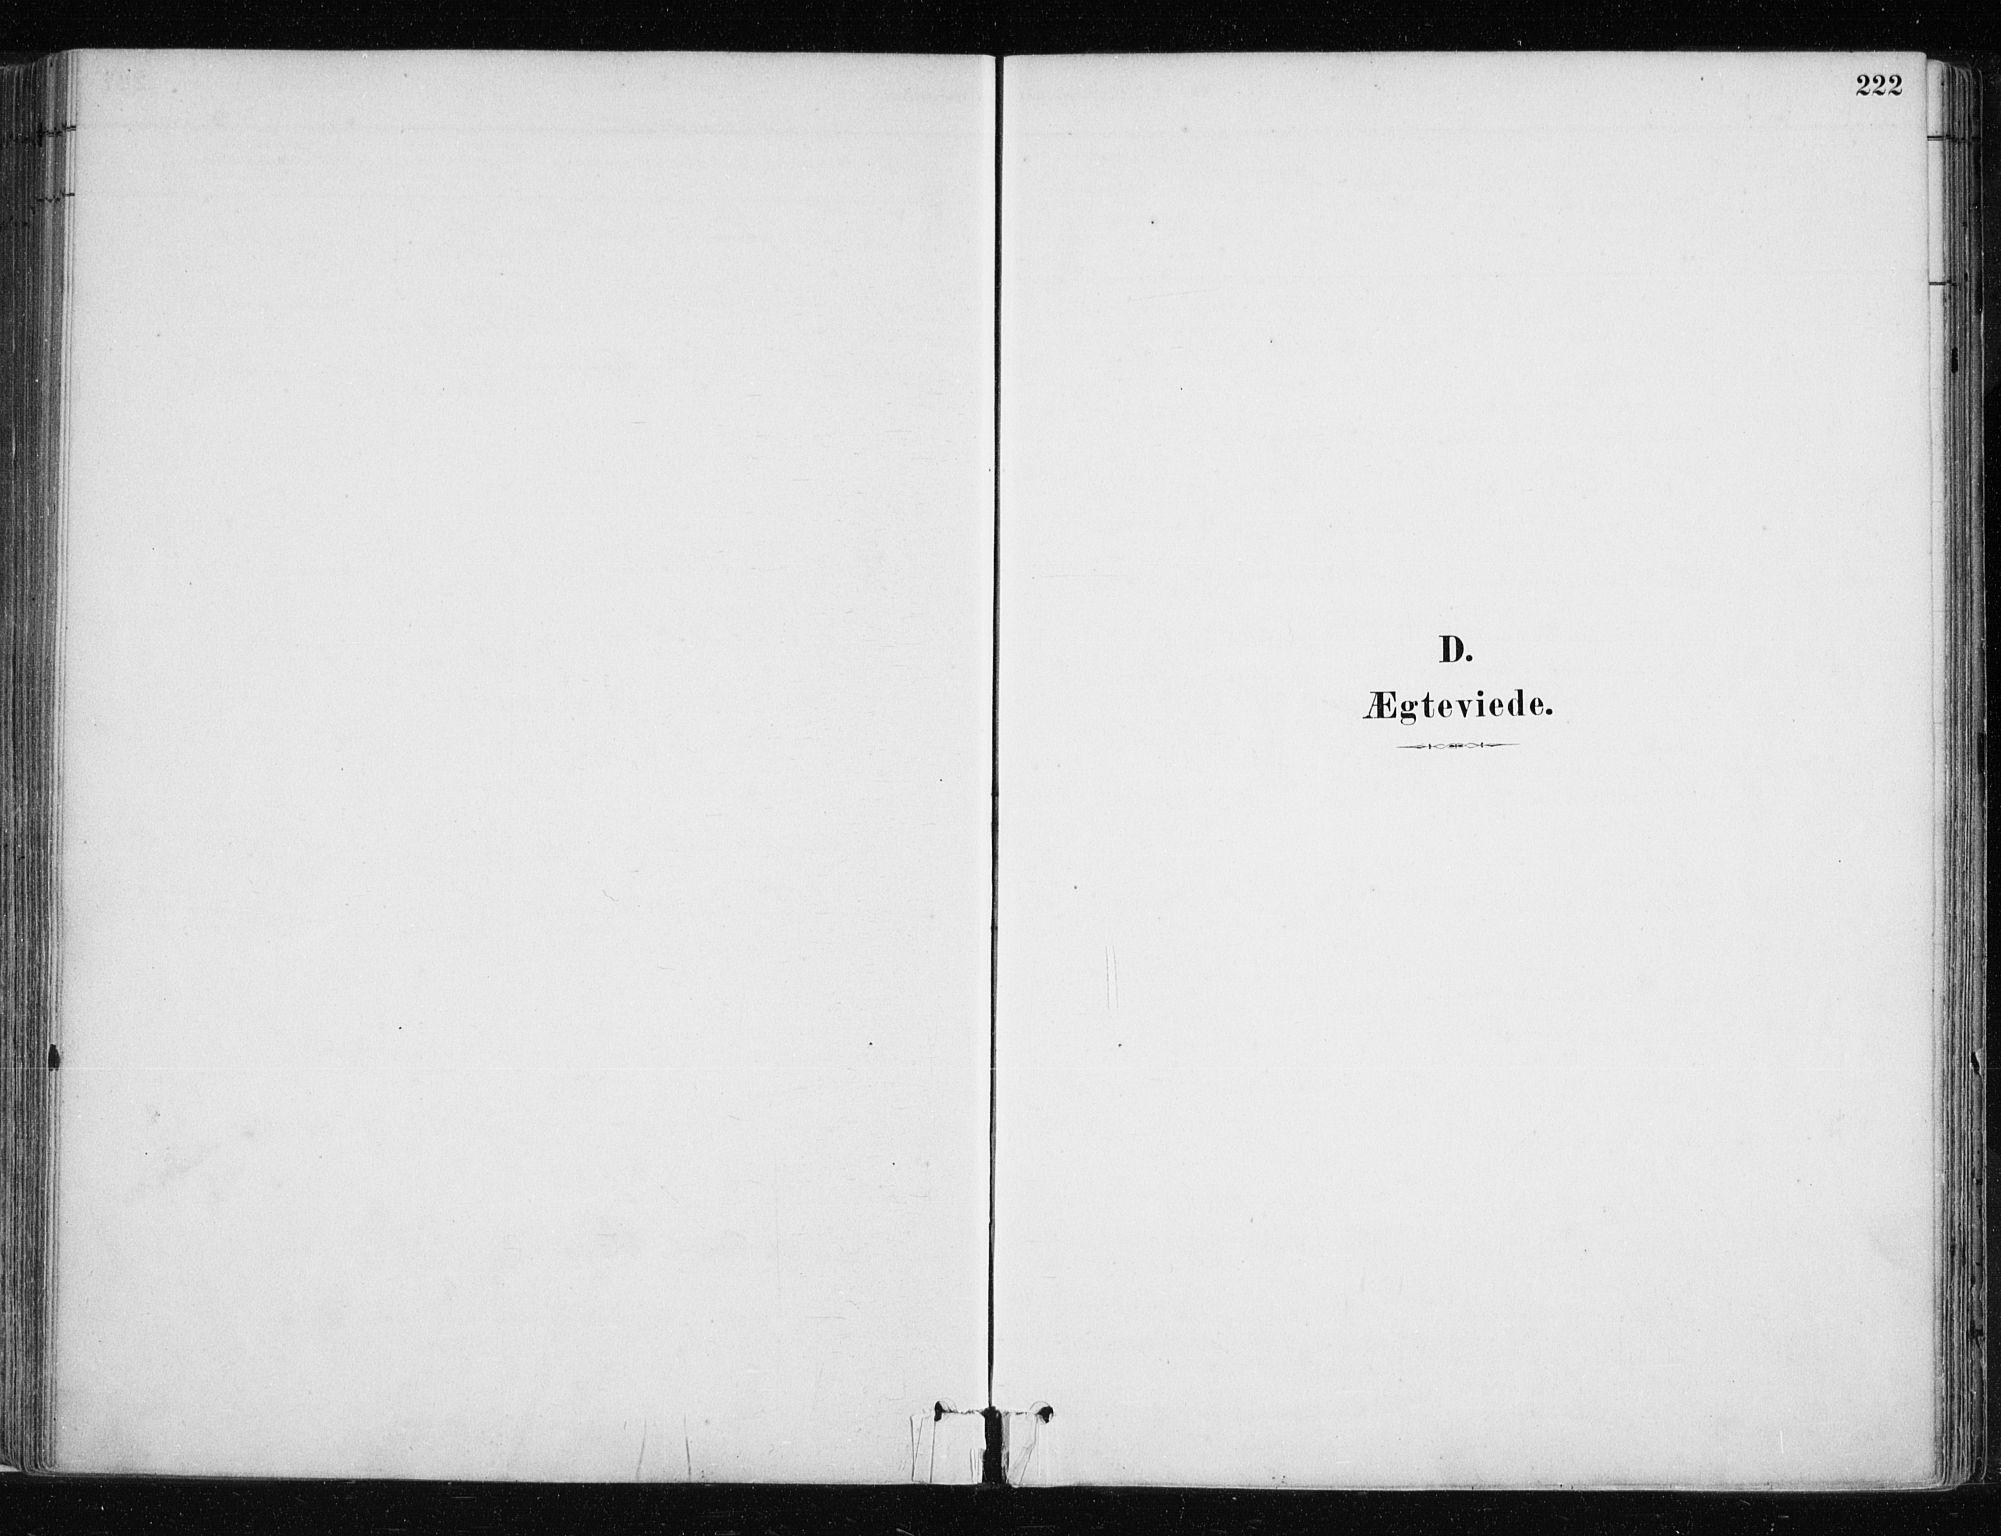 SATØ, Lyngen sokneprestembete, H/He/Hea/L0007kirke: Ministerialbok nr. 7, 1879-1890, s. 222